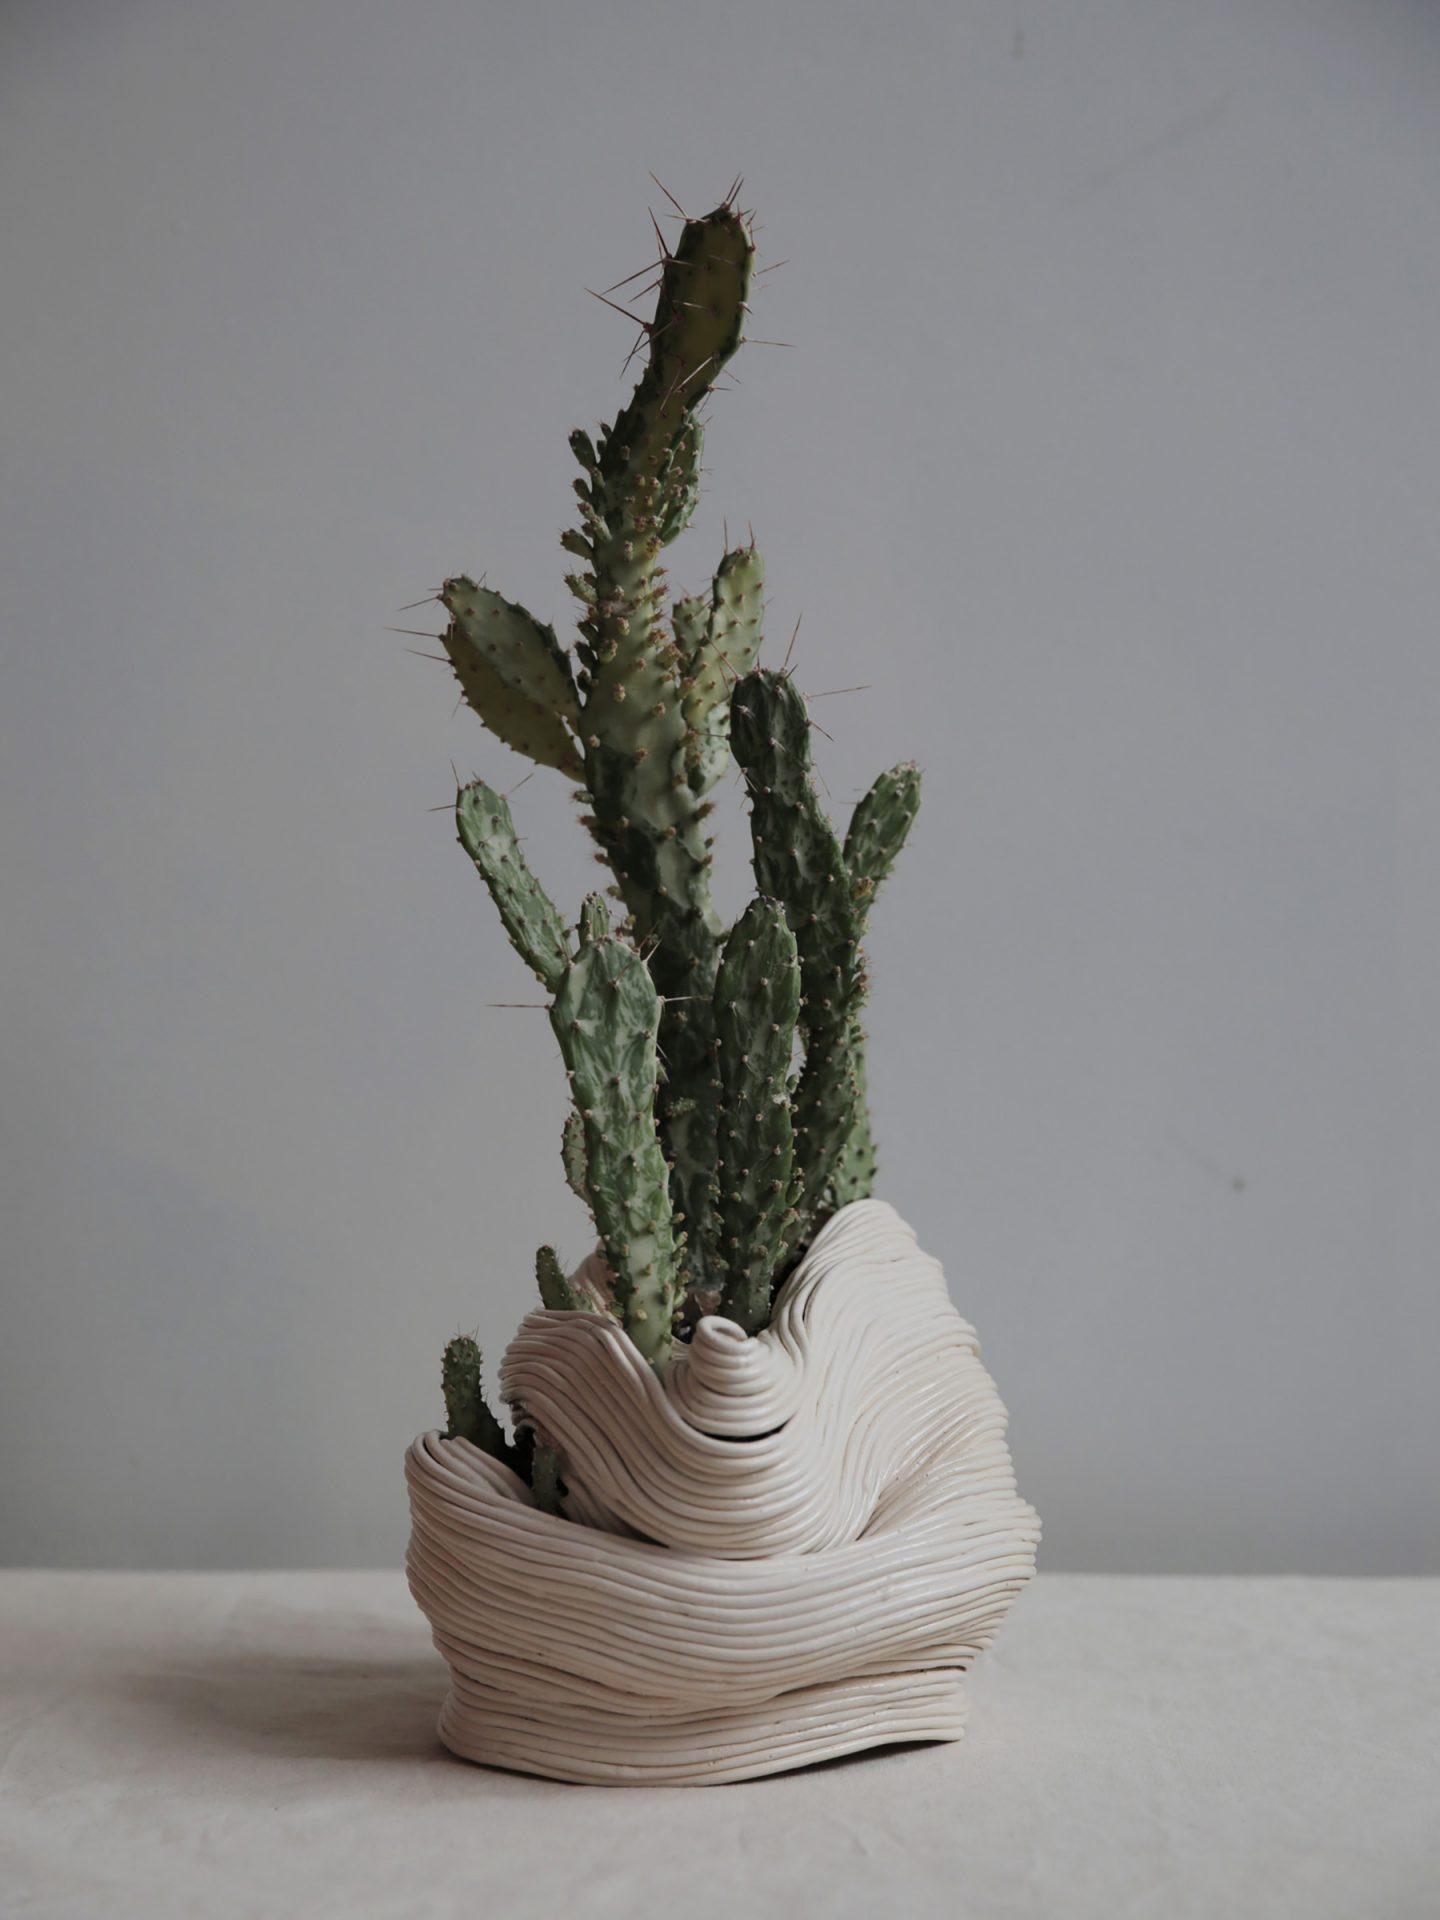 iGNANT-Design-Zhu-Ohmu-Plantsukuroi-04